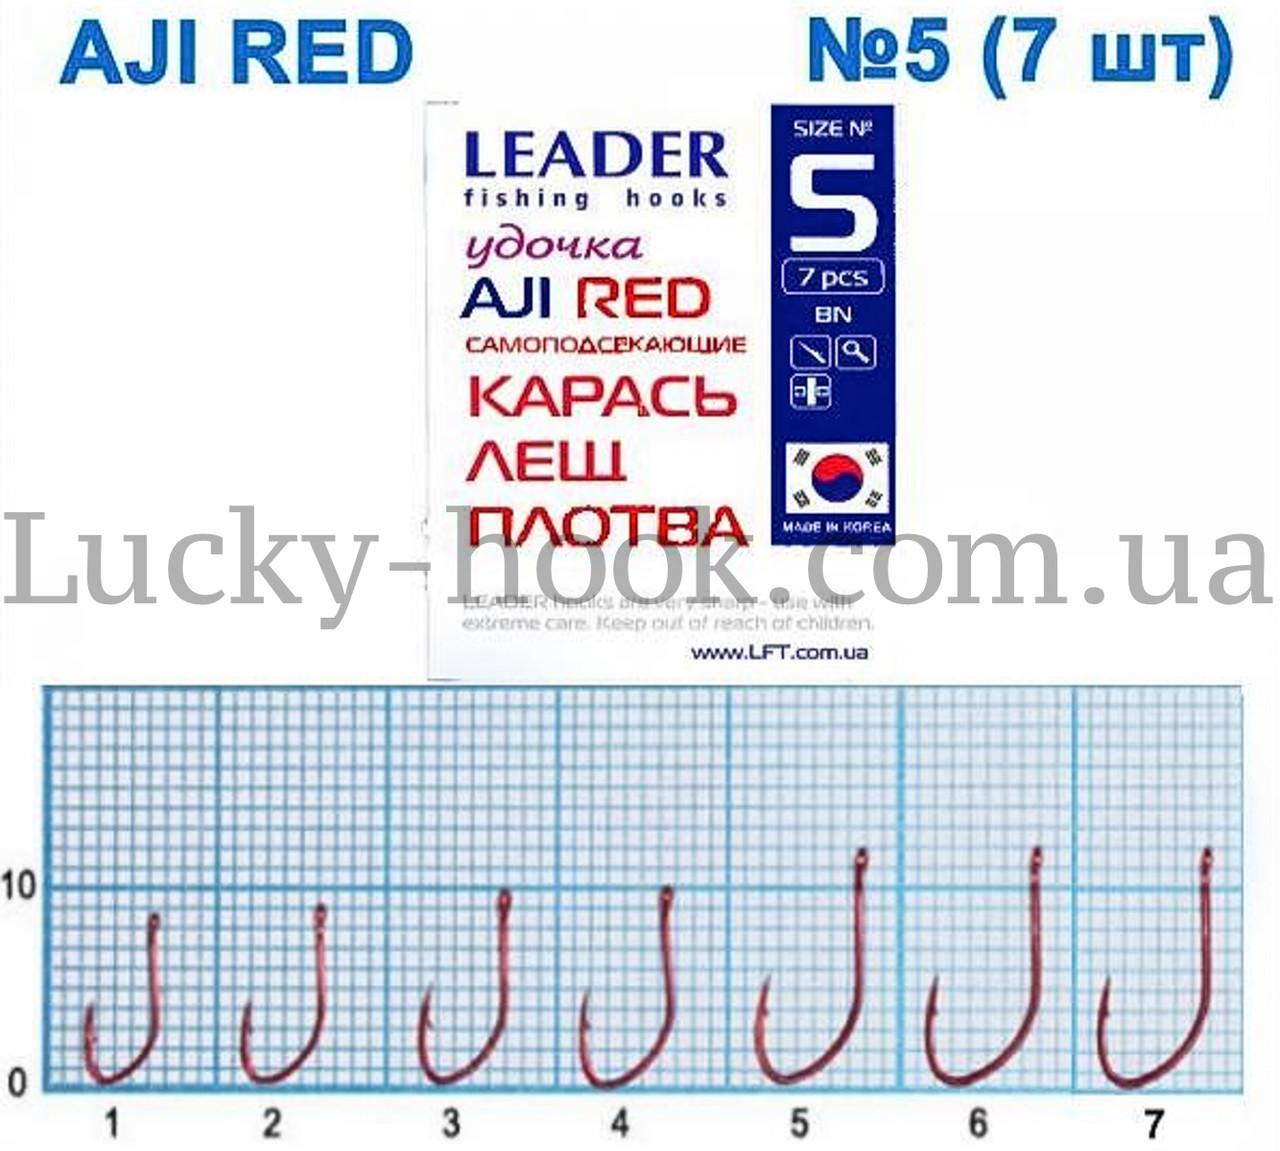 Крючок Leader удочка AJI RED самоподсекающие Карась, лещ, плотва  № 5